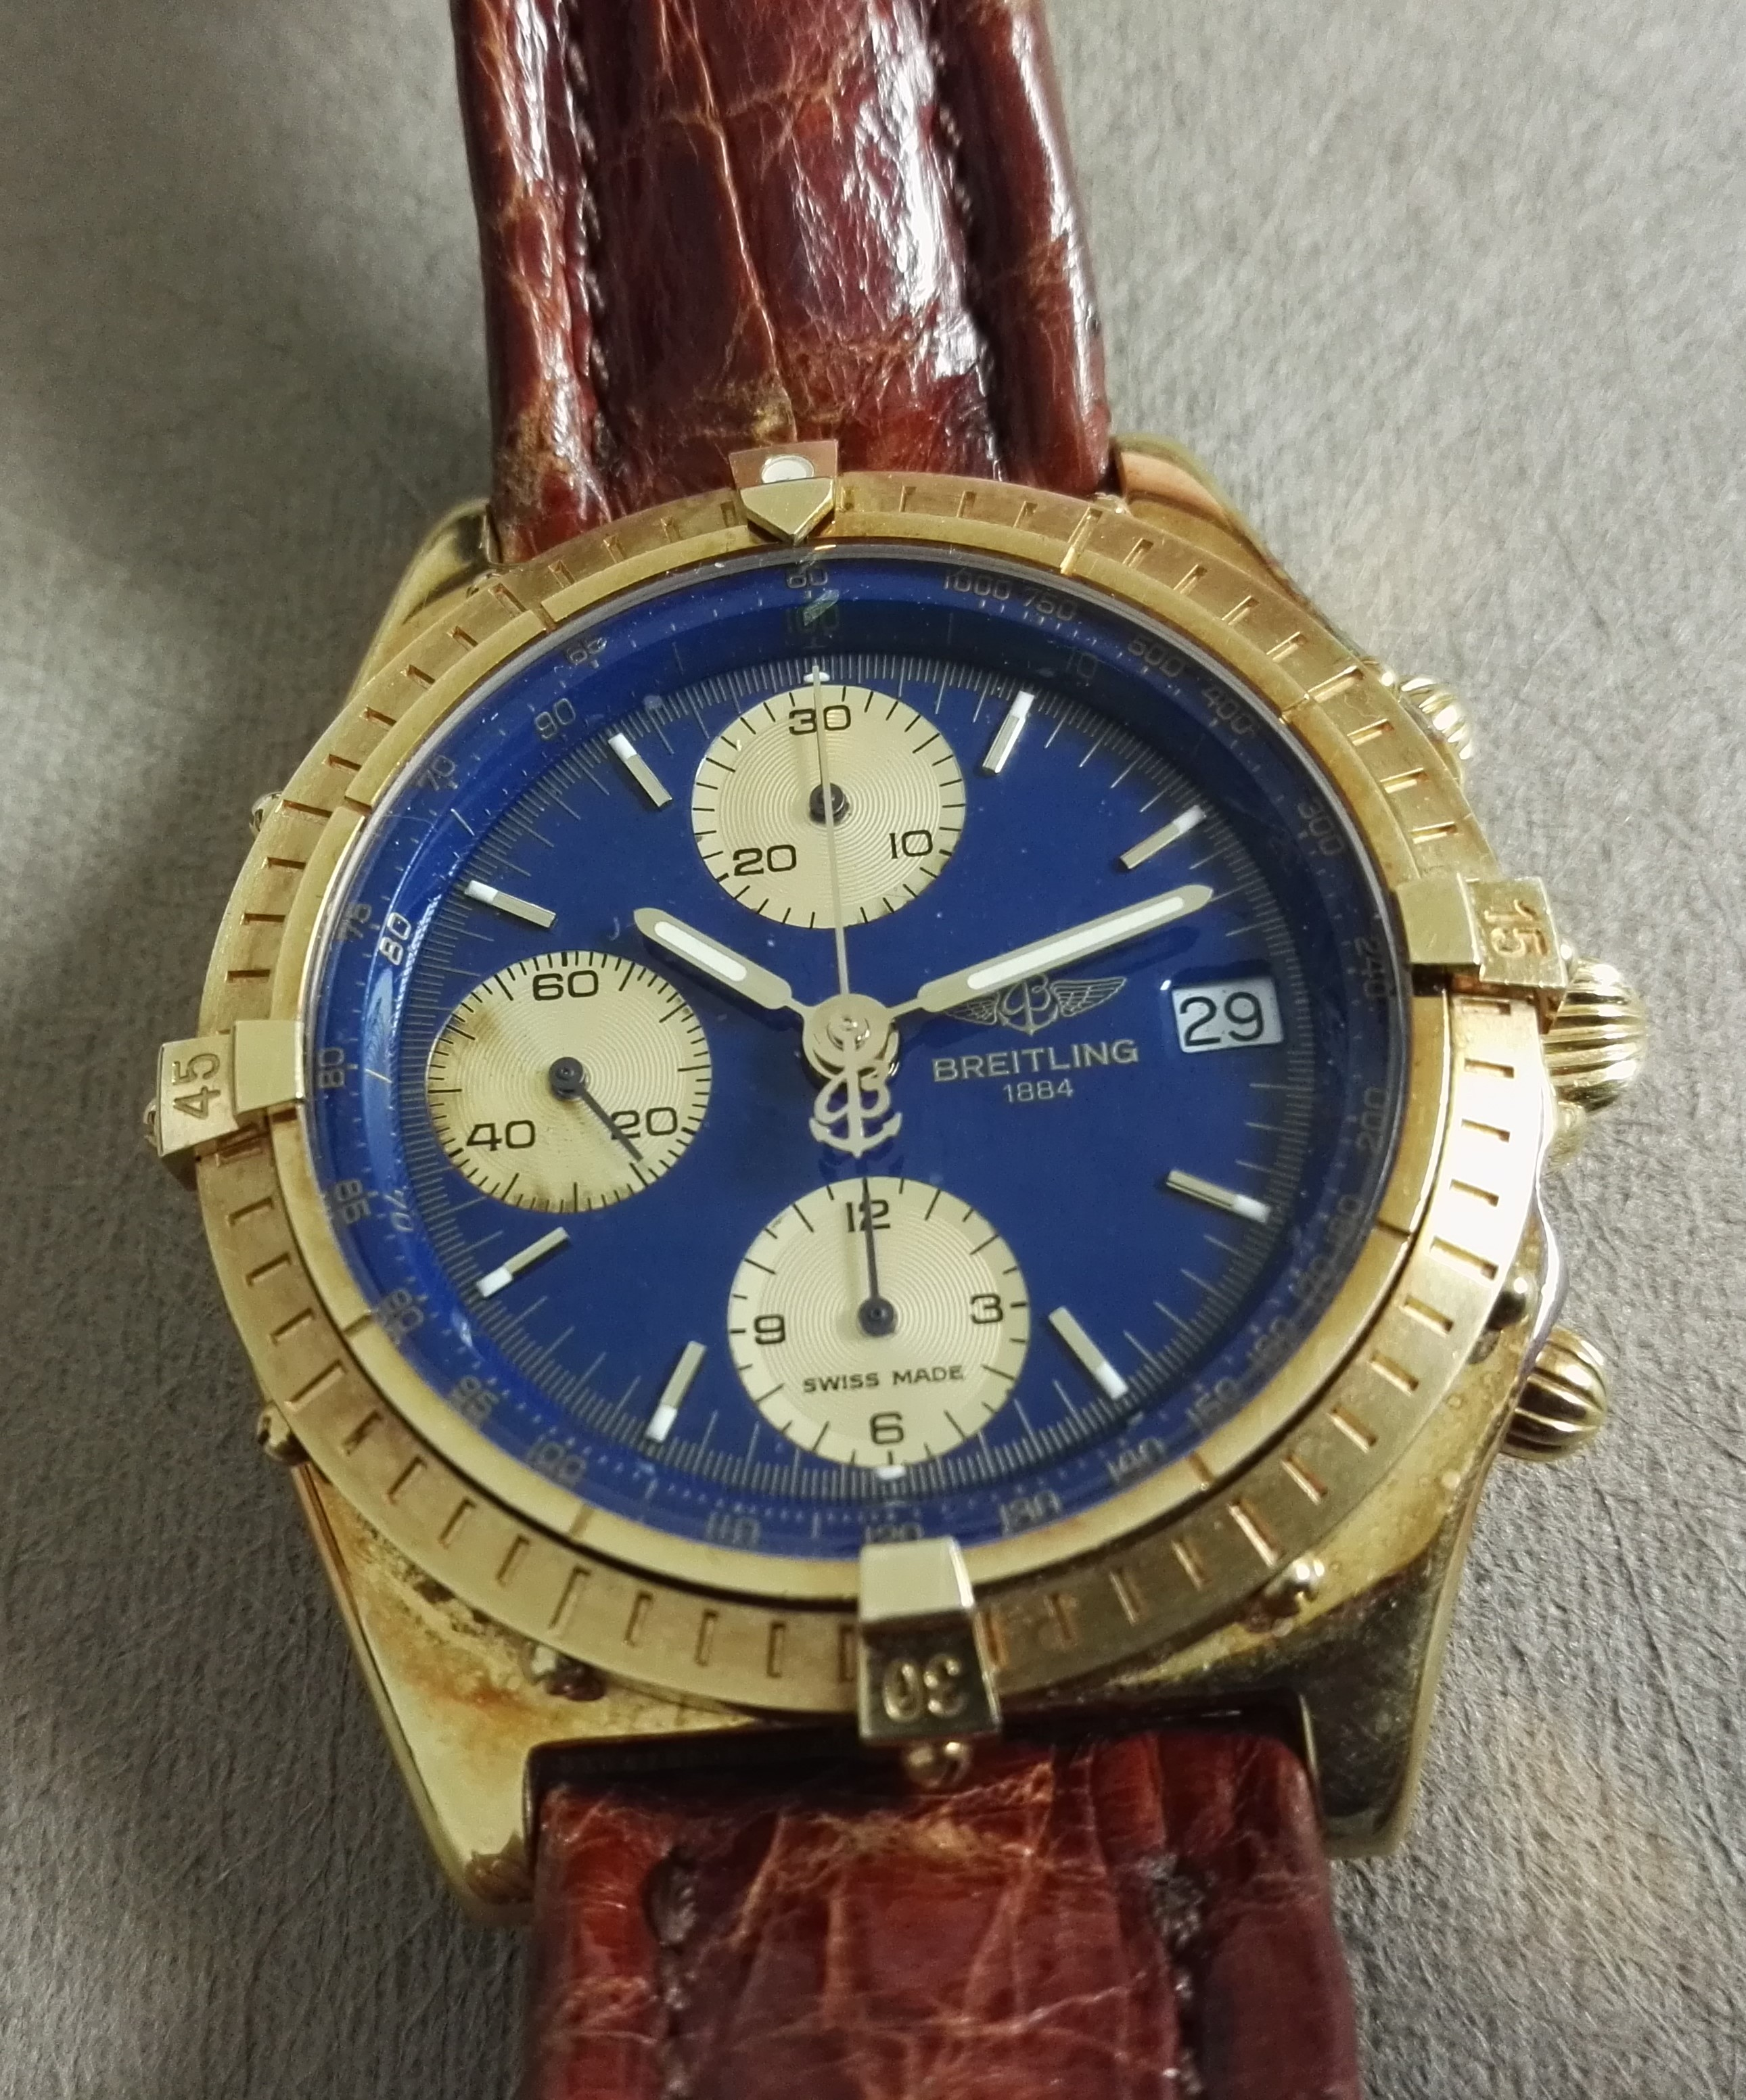 Breitling Chronomat Chronomat Chronograph Automatic 18k Gold K13047 Full Set | San Giorgio a Cremano